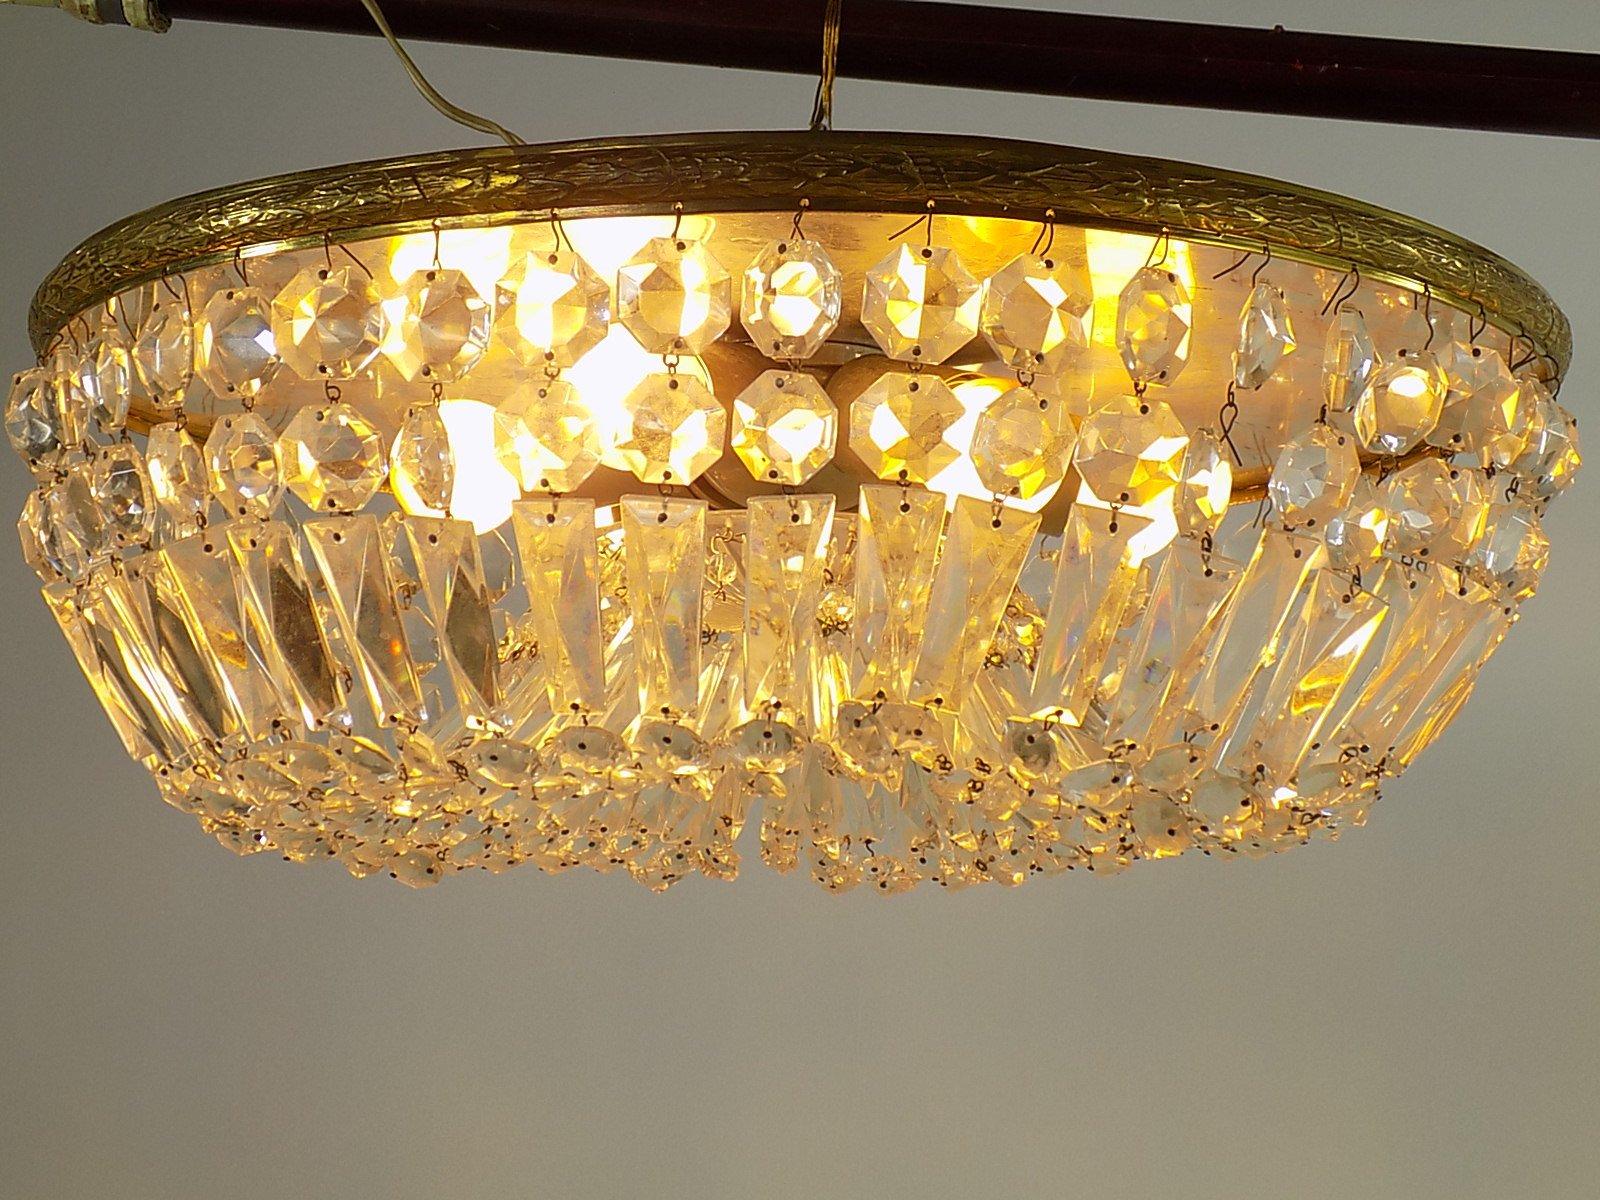 Hollywood Regency Messing & Kristallglas Kronleuchter & 2 Wandlampen, ...